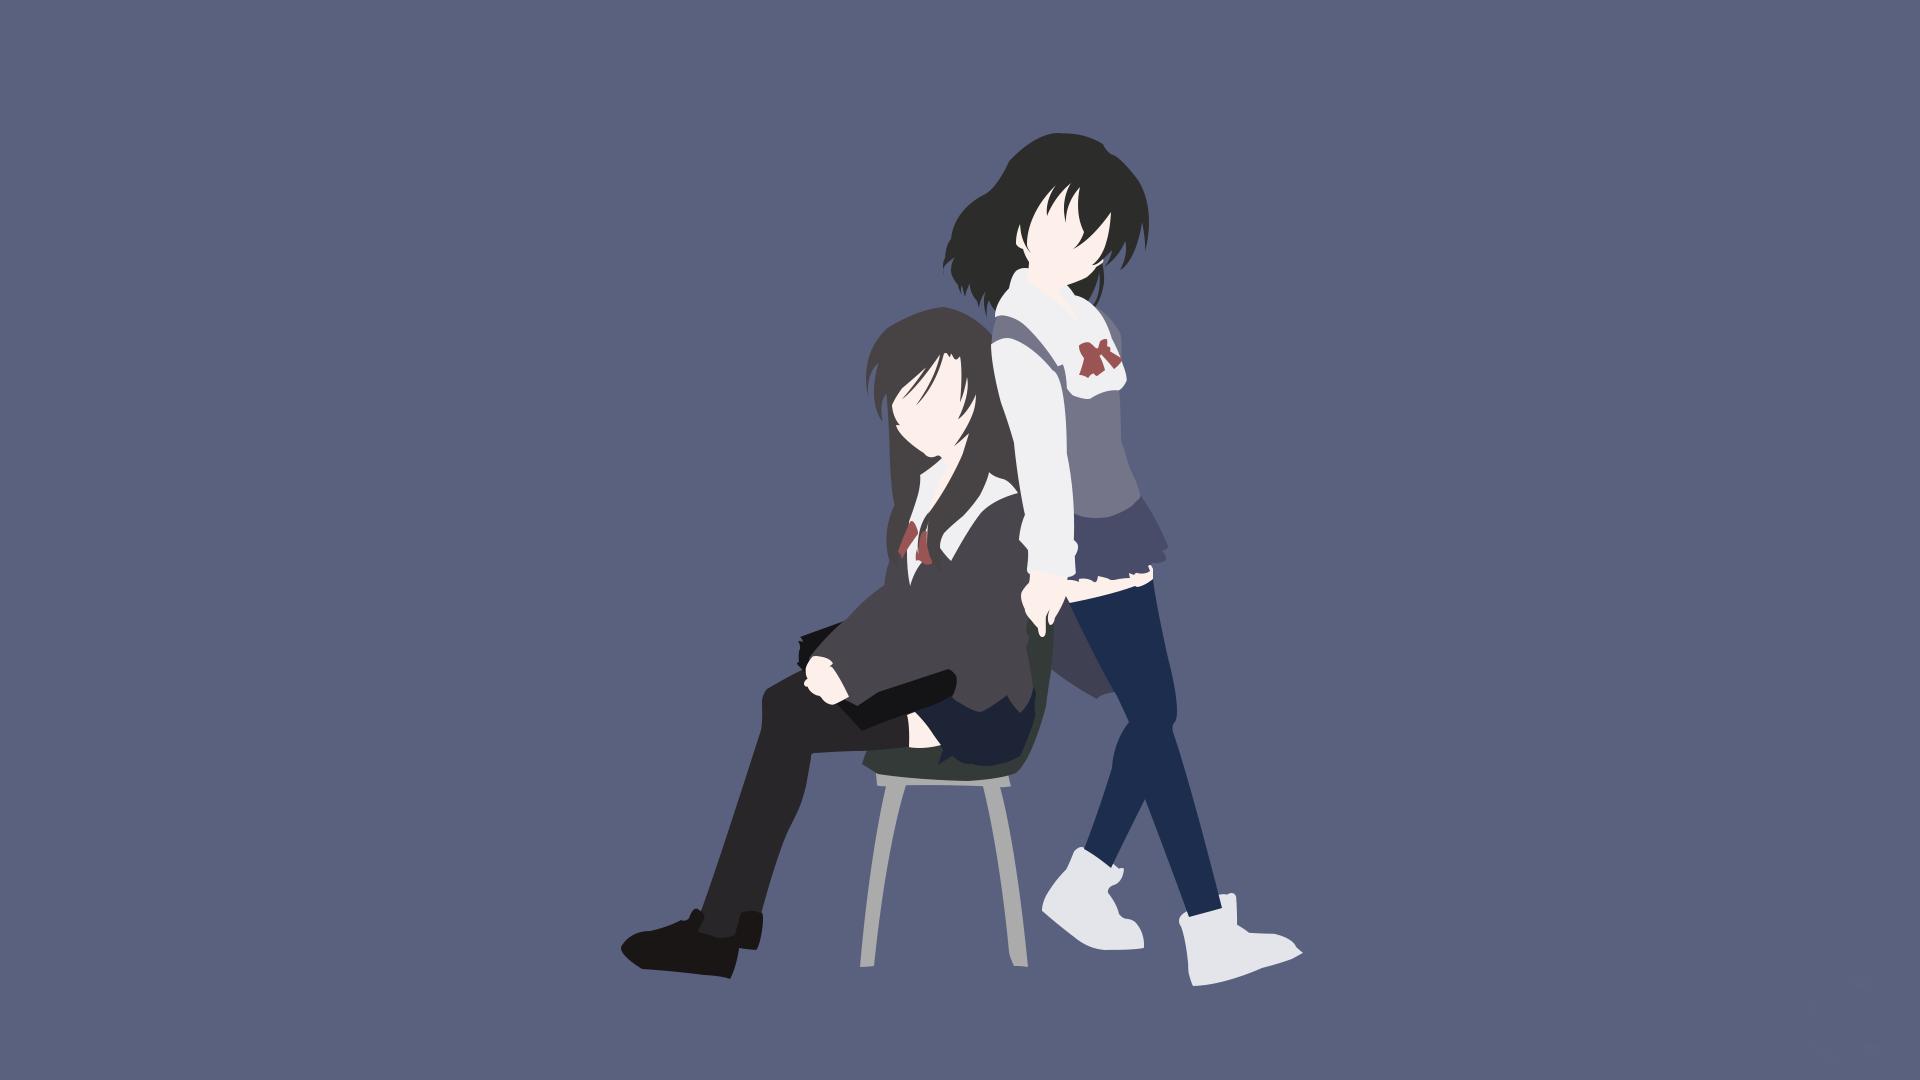 Unduh 8000 Wallpaper Anime Days Hd  Terbaik